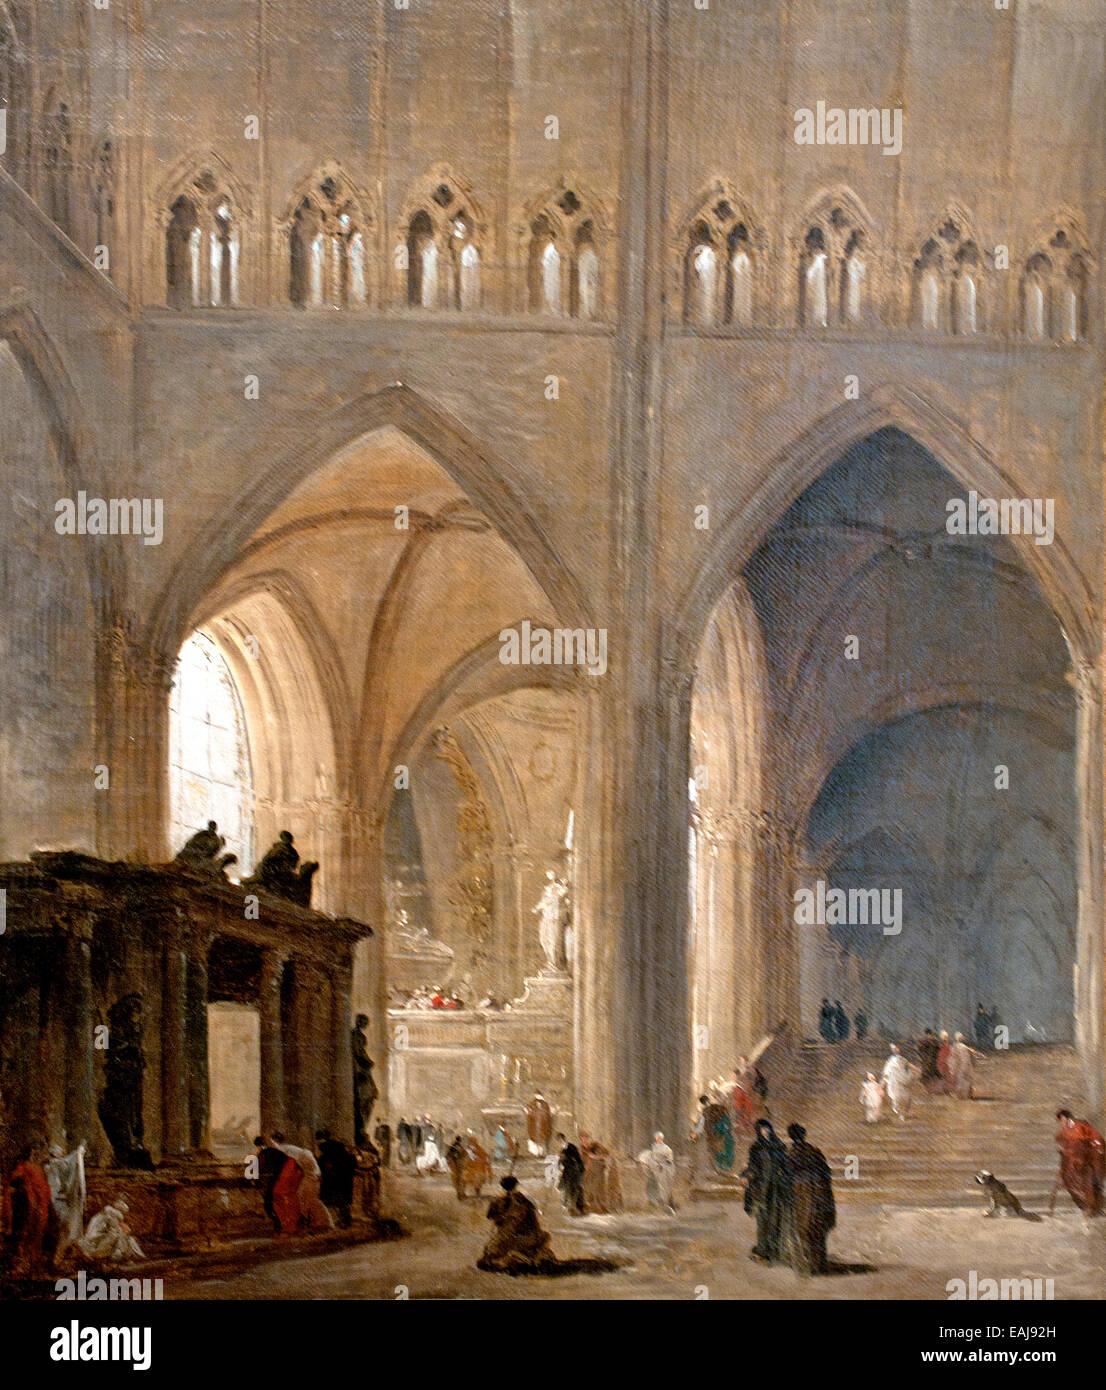 https://c8.alamy.com/comp/EAJ92H/intrieur-de-l-glise-saint-denis-inside-the-church-of-st-denis-in-1770-EAJ92H.jpg